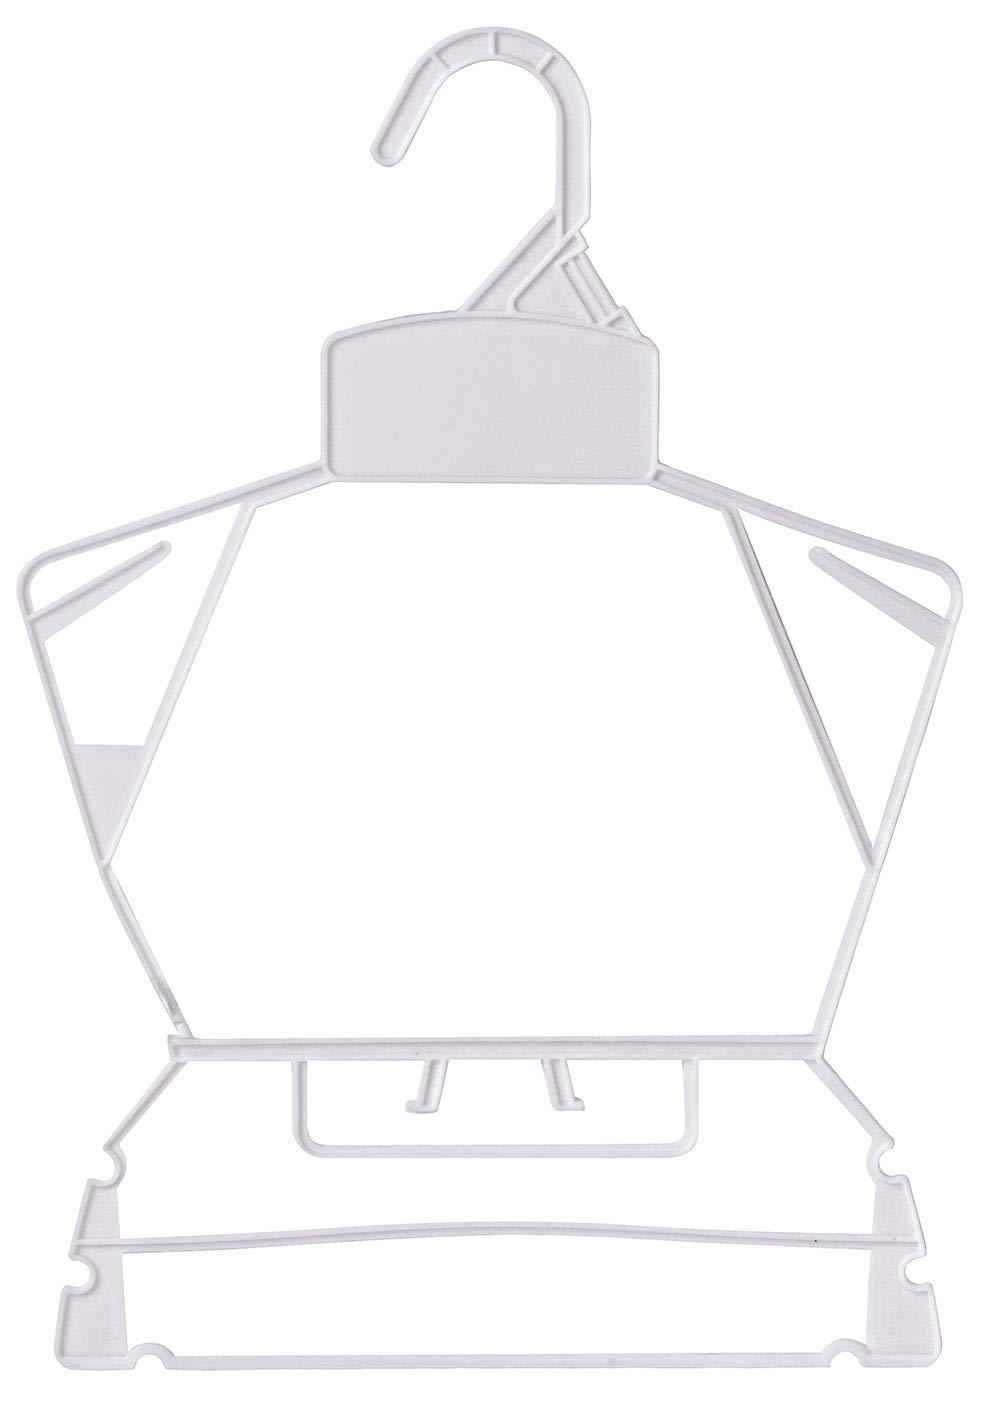 Economy White Children's Plastic Clothing Hanger Set - Case of 250 by SSWBasics